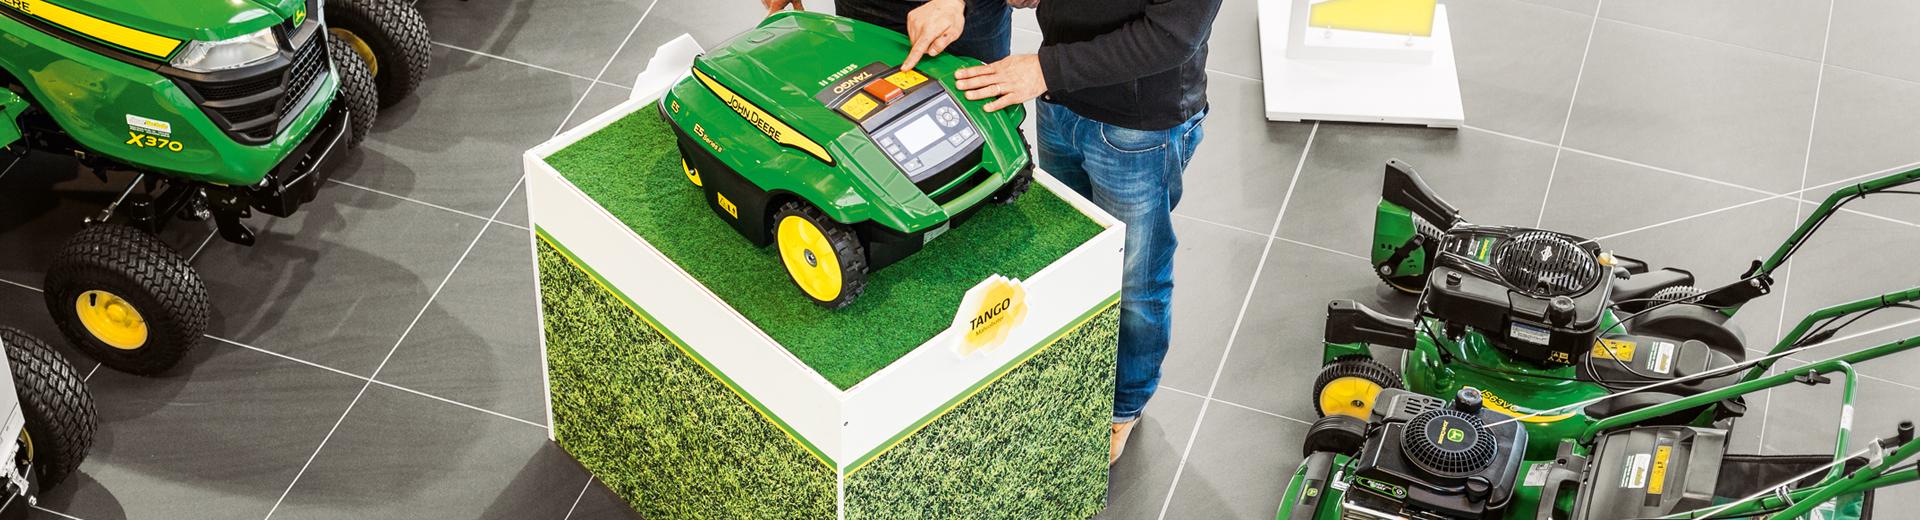 AGRI Tuinmachines - uw groenspecialist